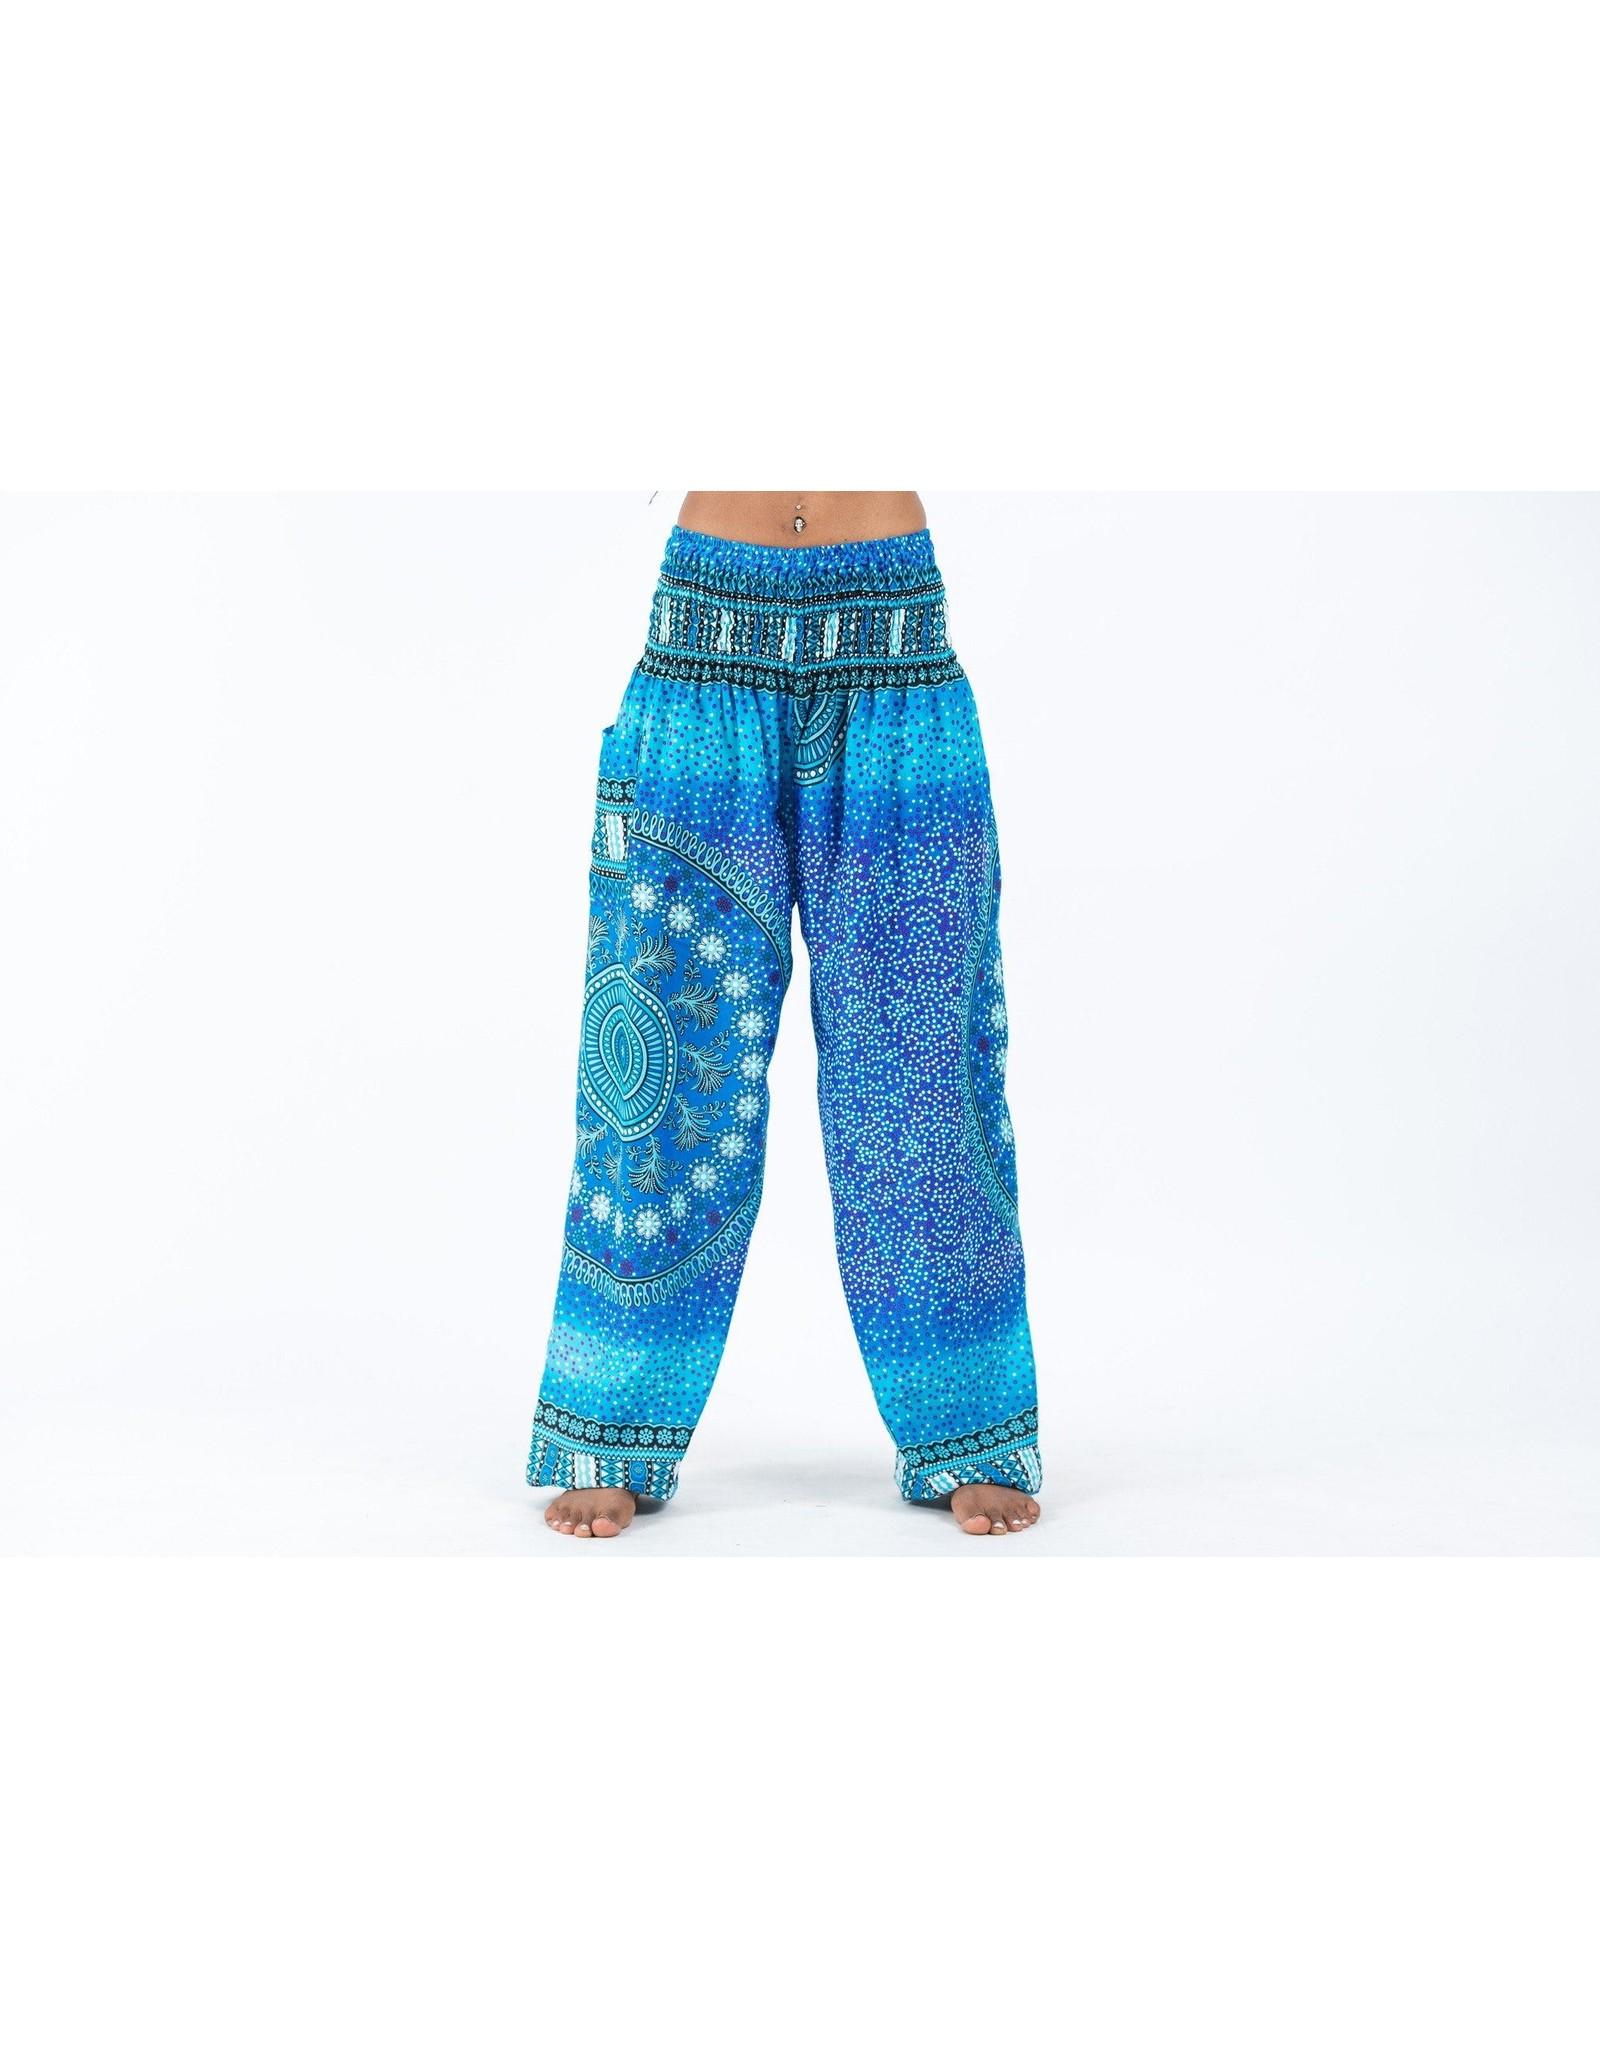 Elephant Pants, Chakras Blue, Thailand